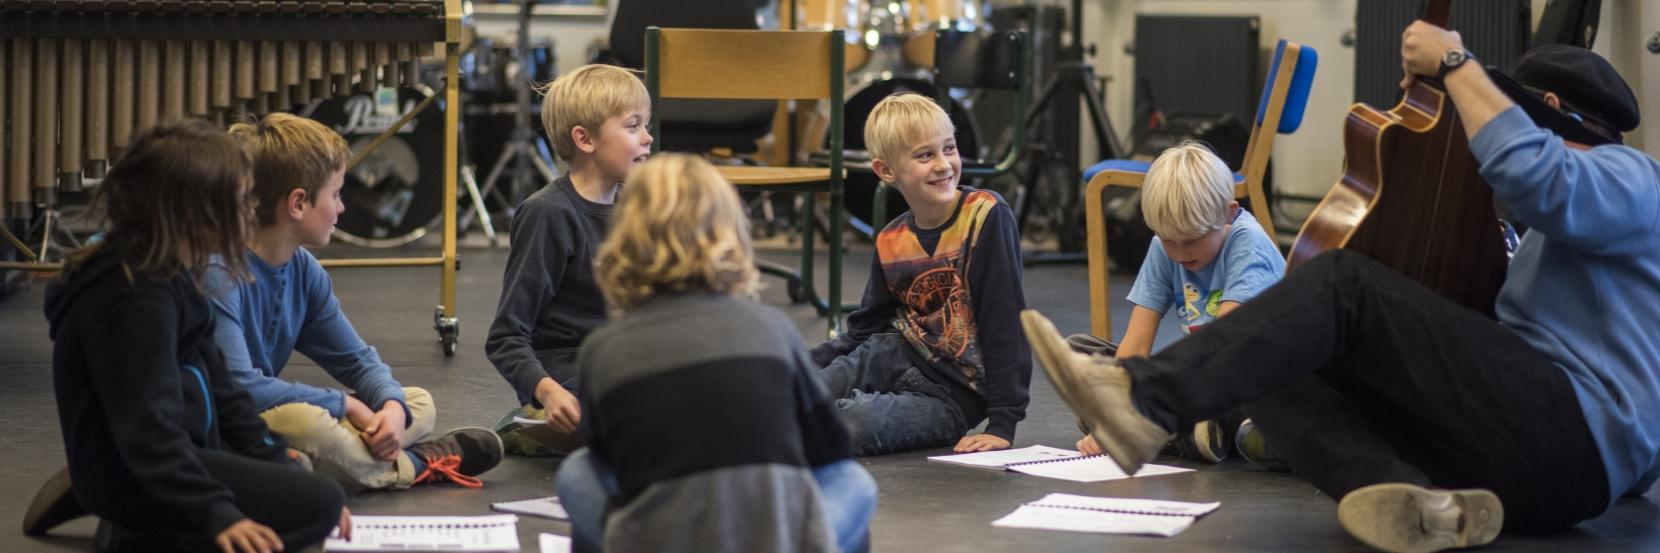 Elever i Rudersdal Musikskole